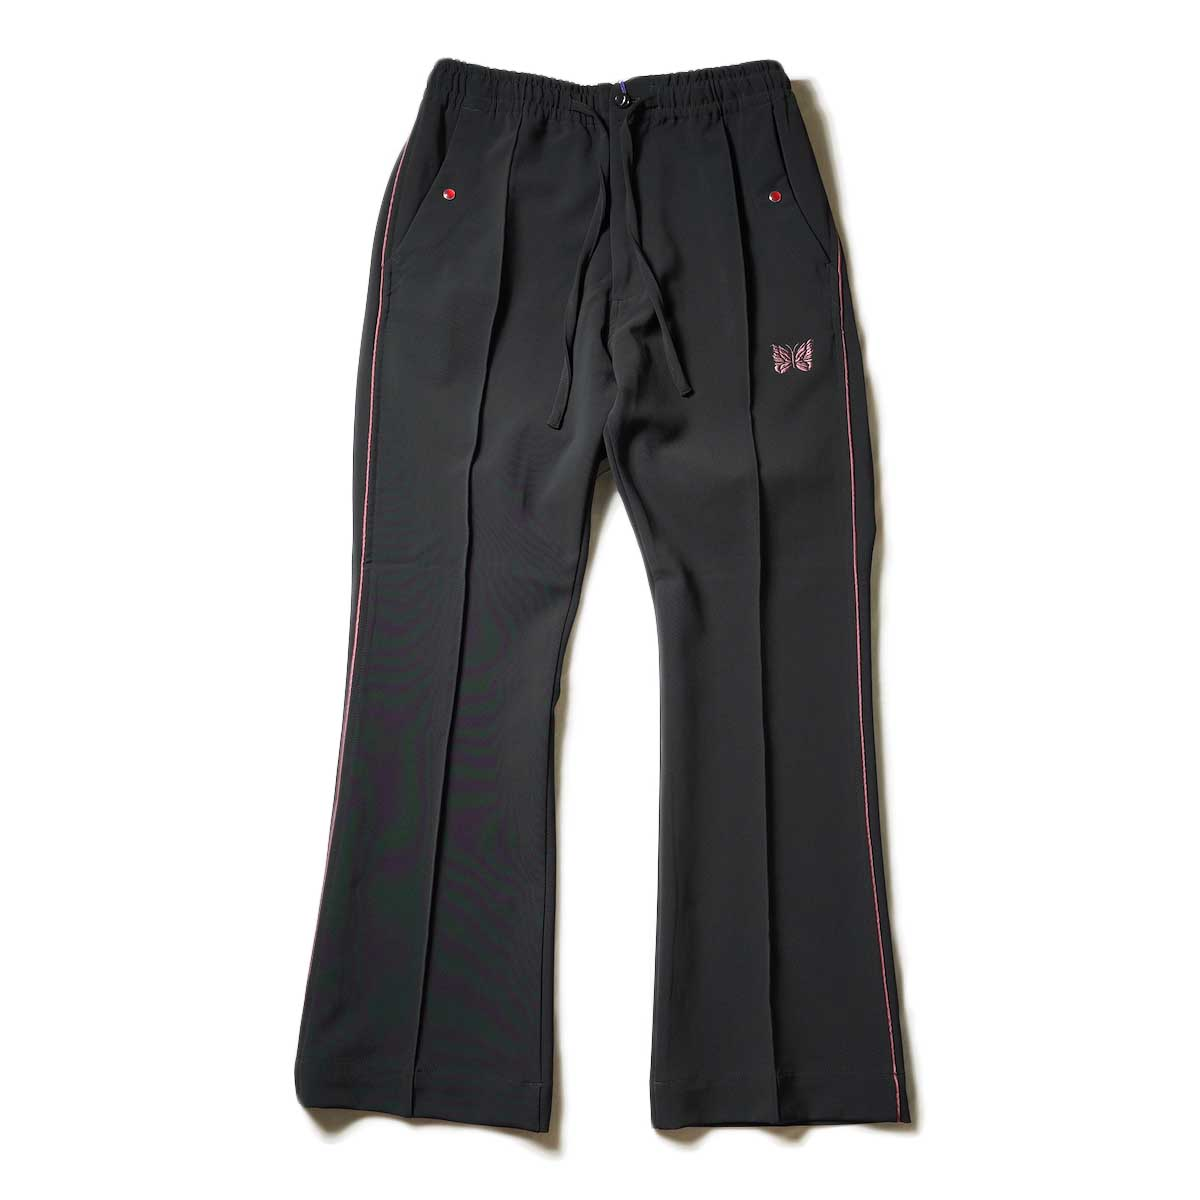 Needles / Piping Cowboy Pants - Pe/Pu Double Cloth (Black)